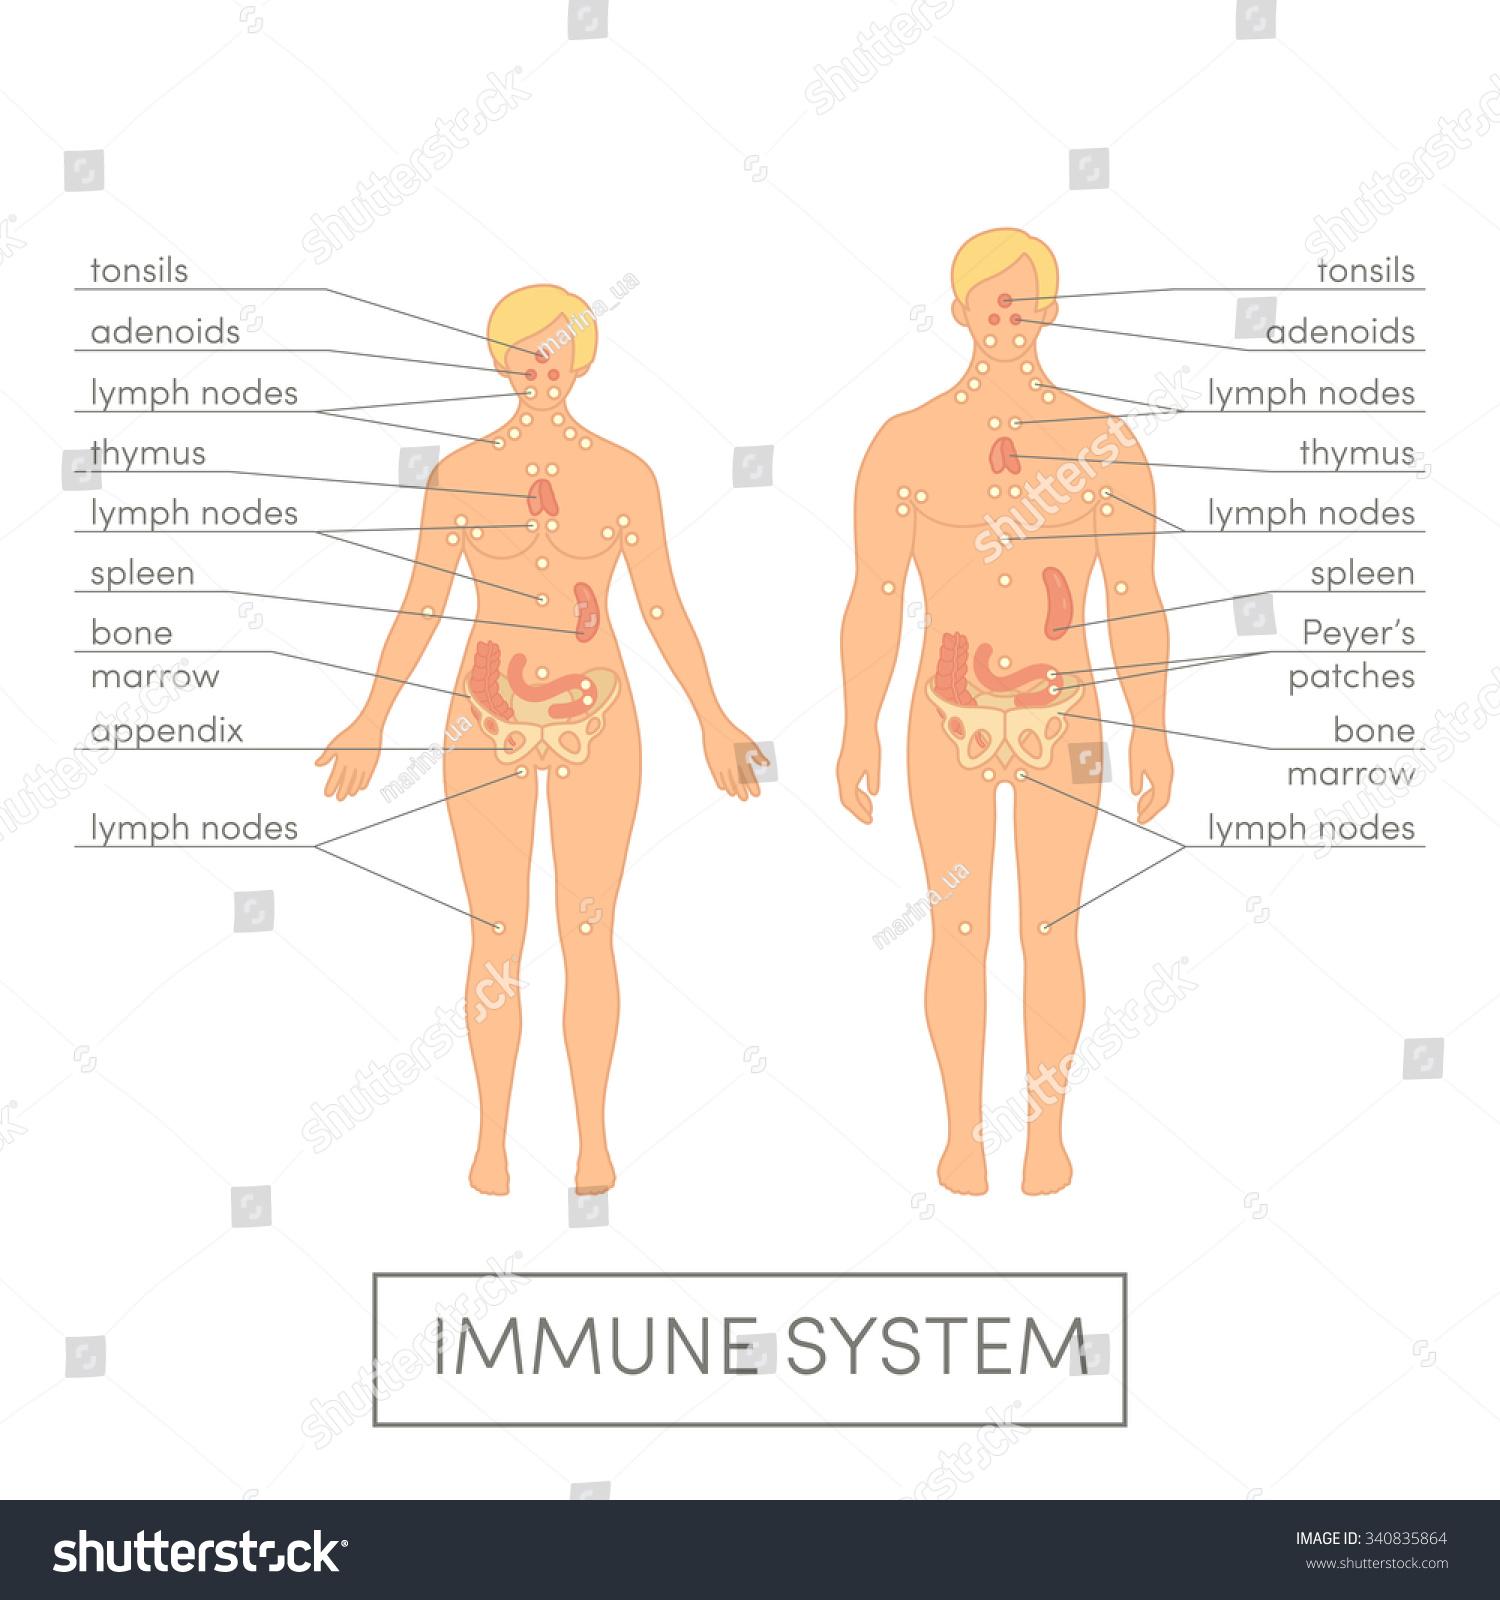 Immune System Human Cartoon Vector Illustration Stock Vector ...